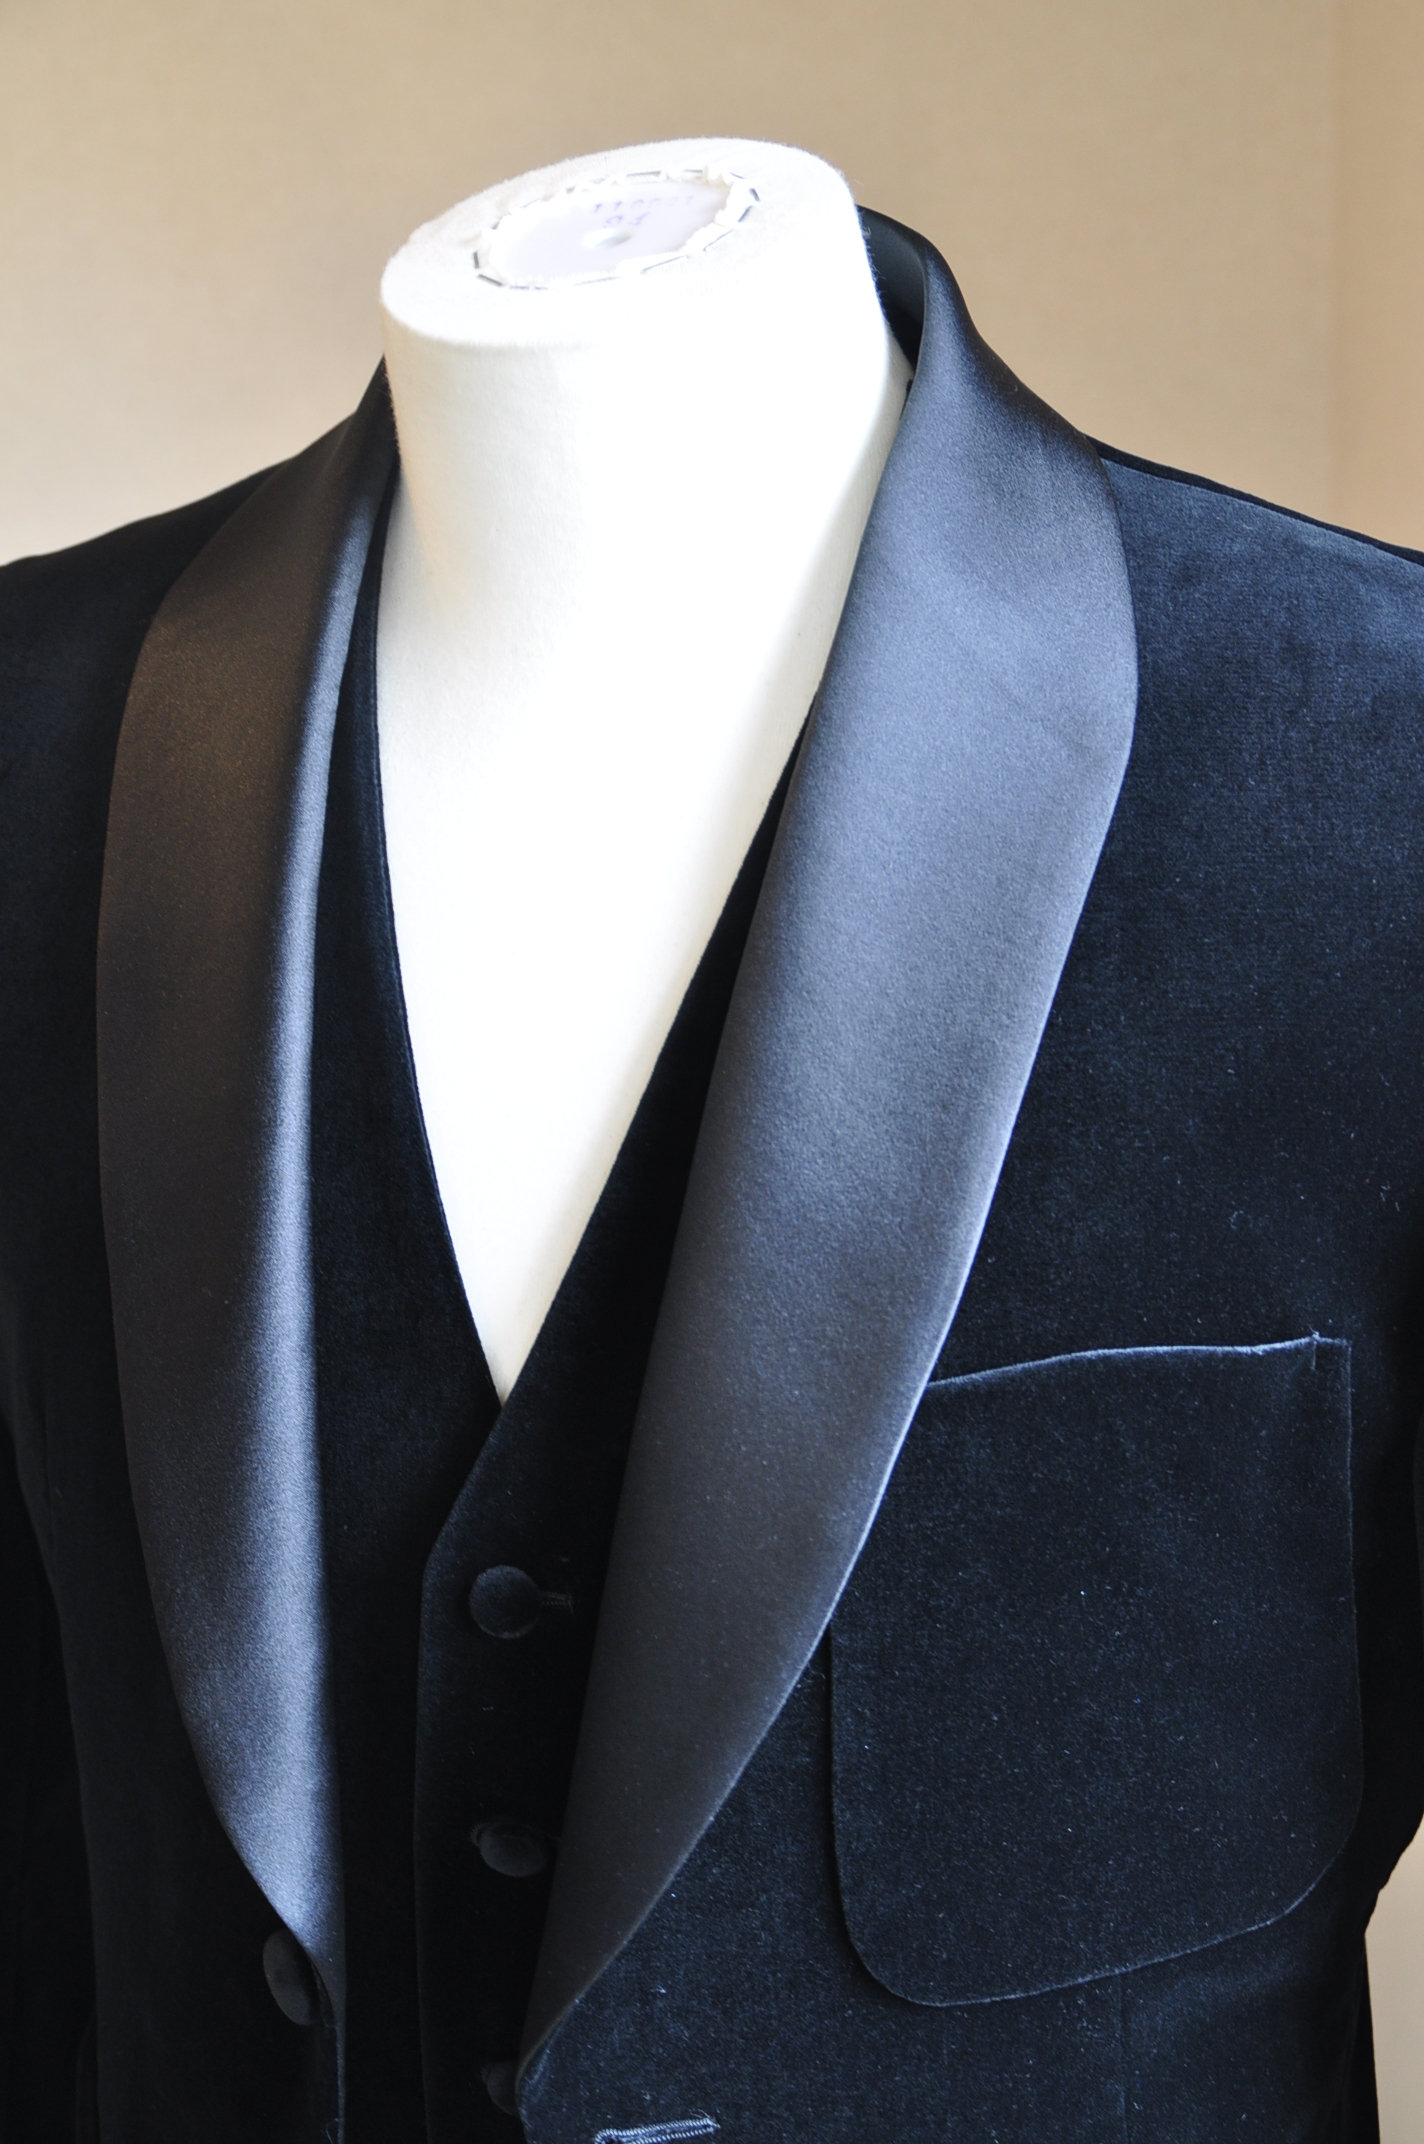 DSC06082 胸ポケット 名古屋の完全予約制オーダースーツ専門店DEFFERT